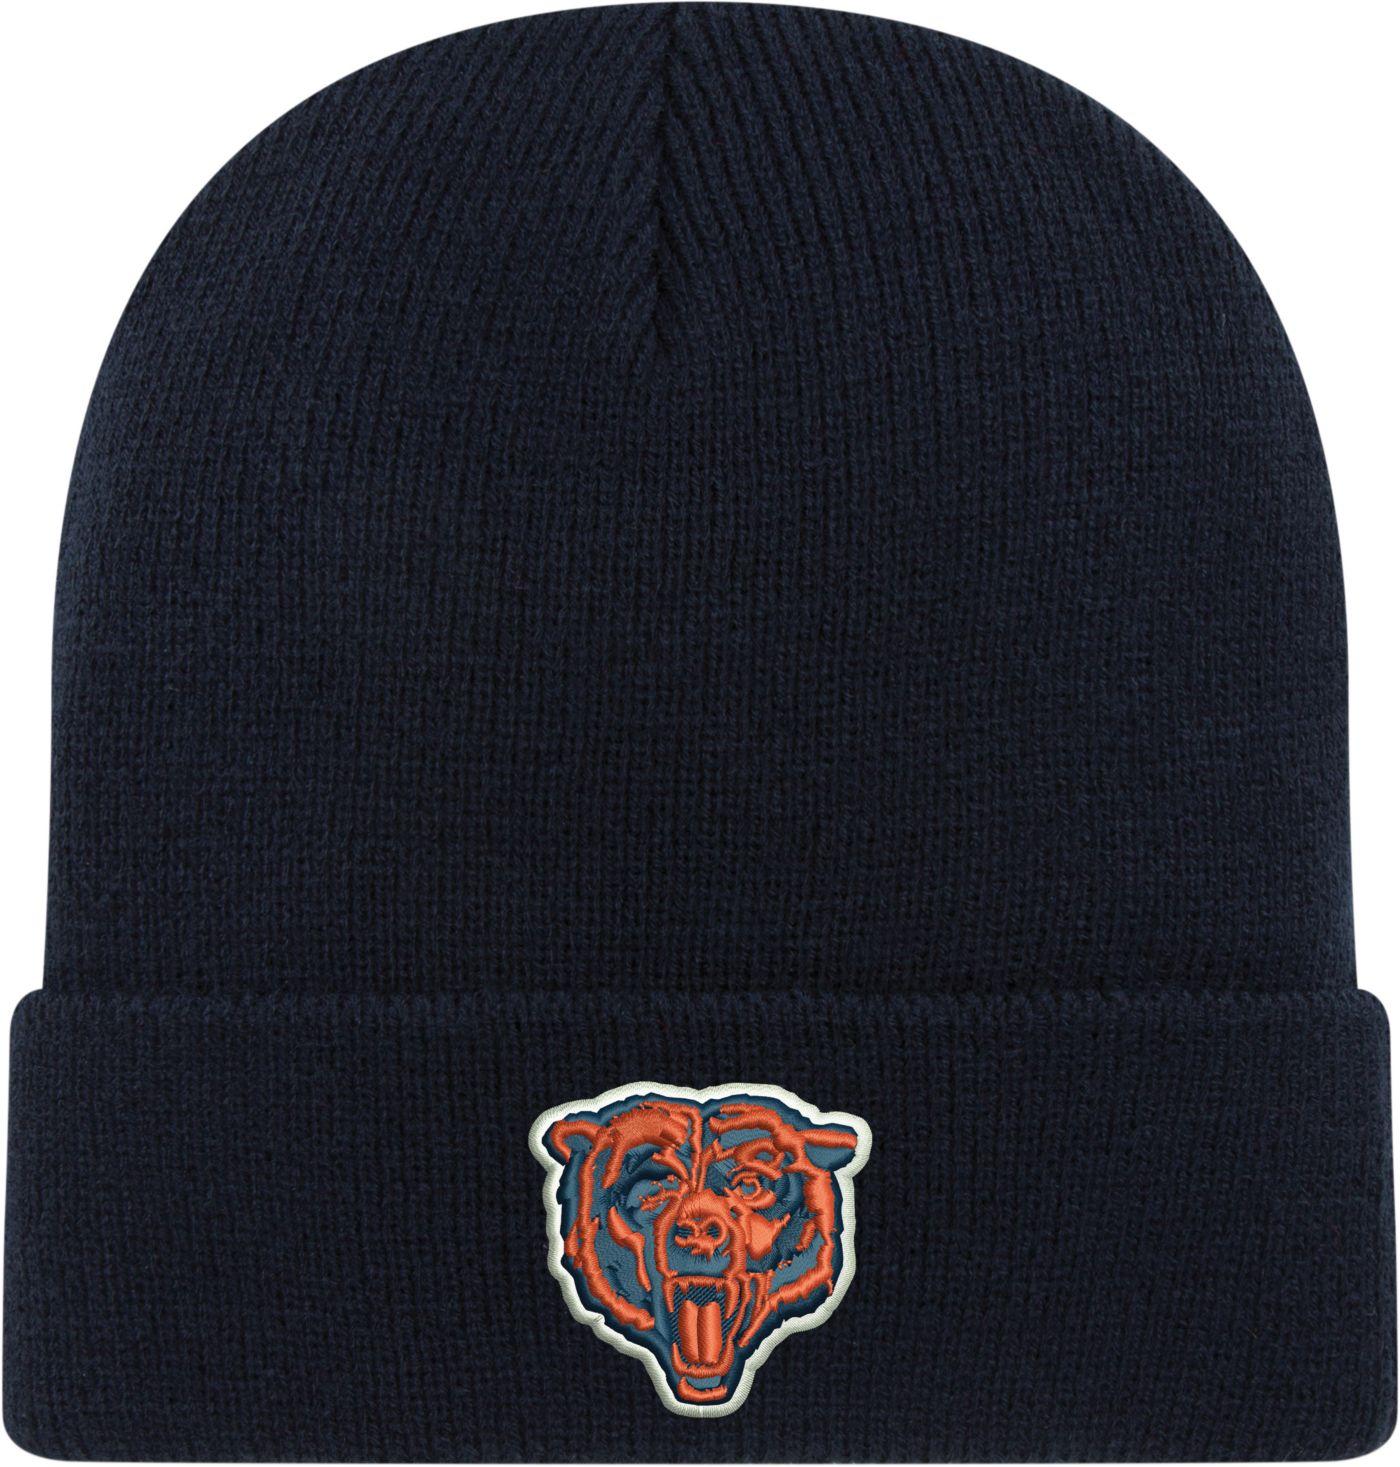 New Era Men's Chicago Bears Navy Cuffed Knit